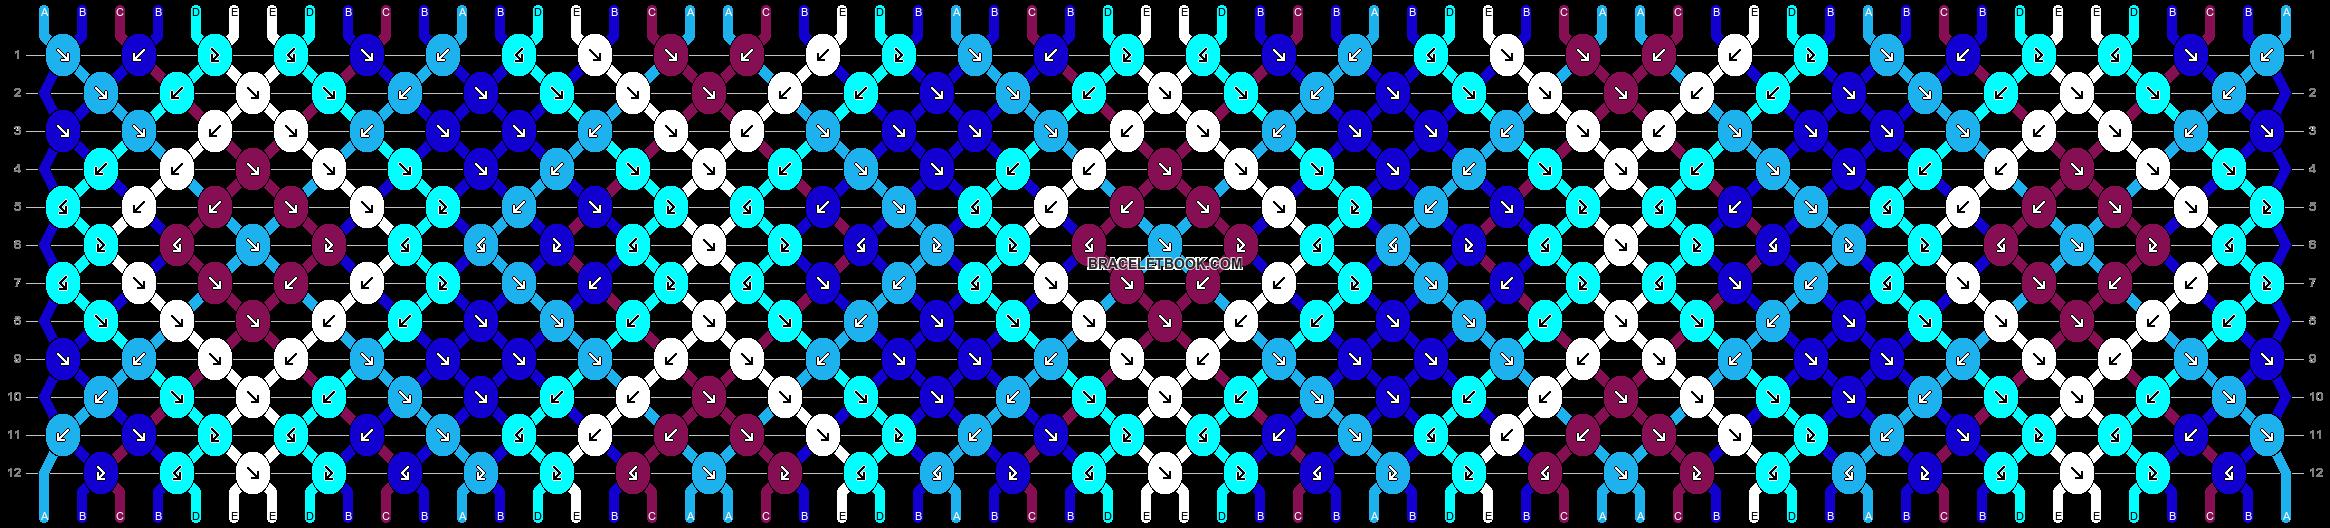 Normal pattern #50760 pattern